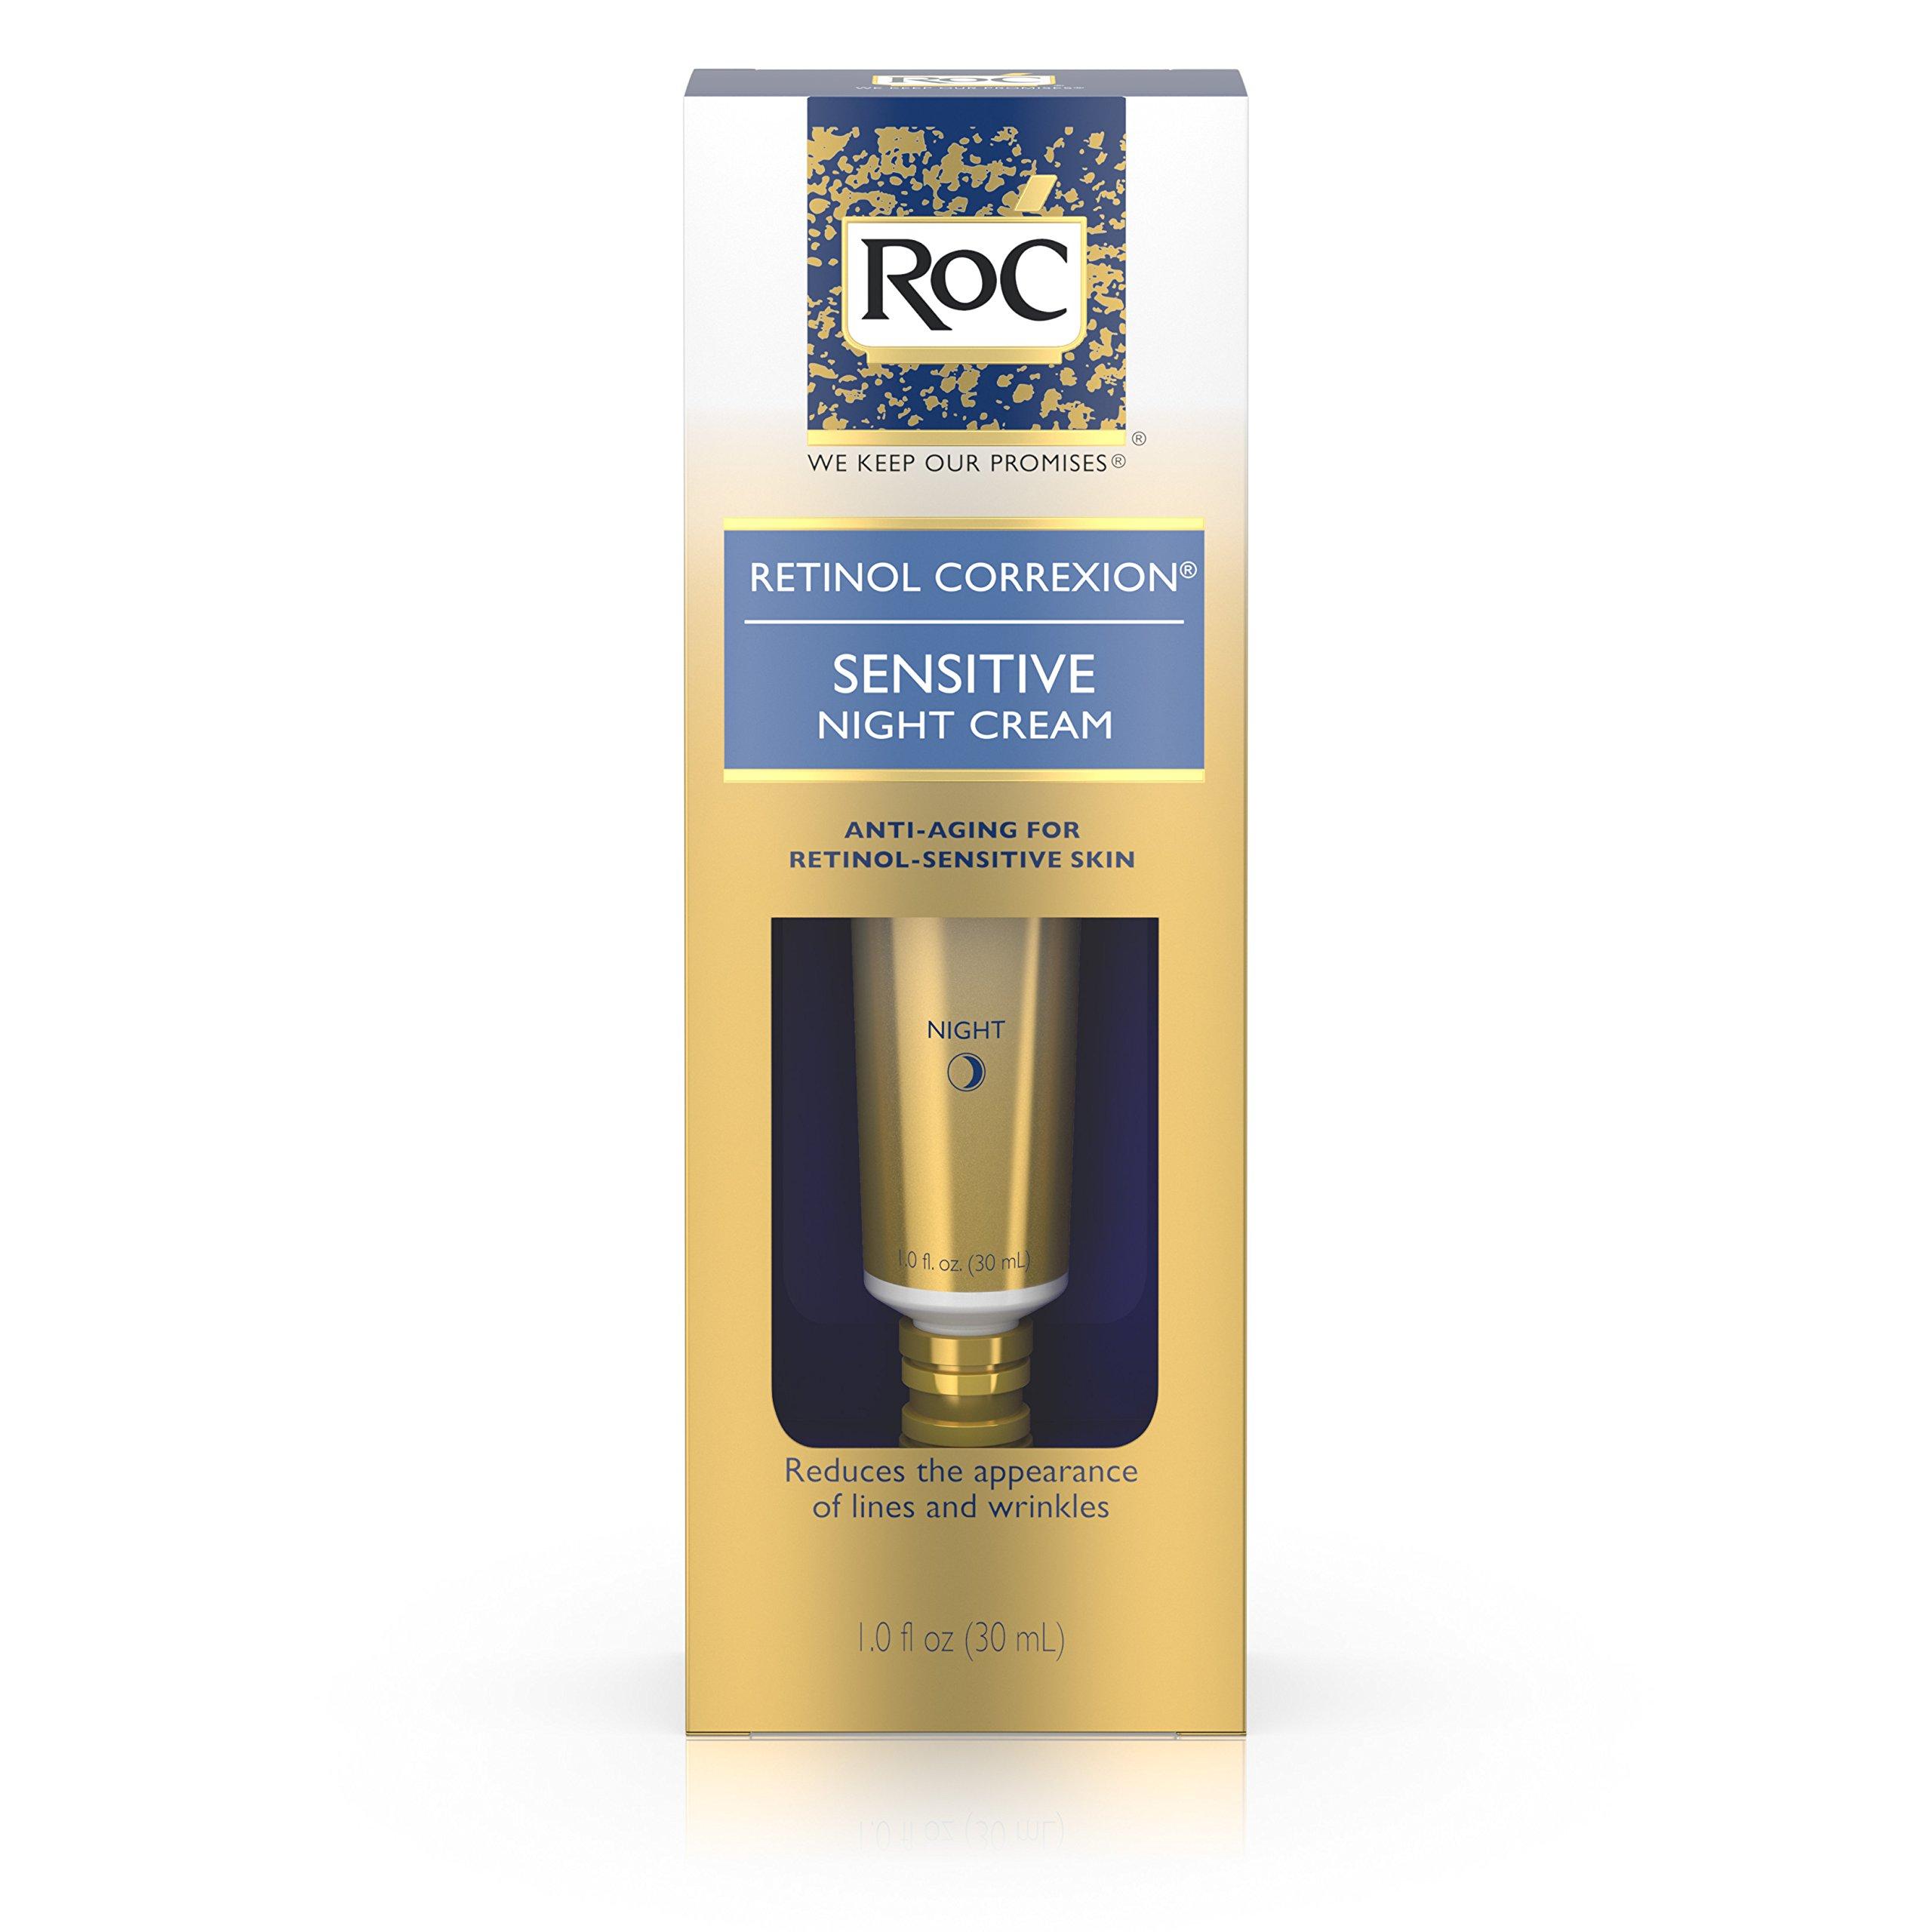 Roc Retinol Correxion Anti-Aging Sensitive Skin Night Cream, 1 Oz.